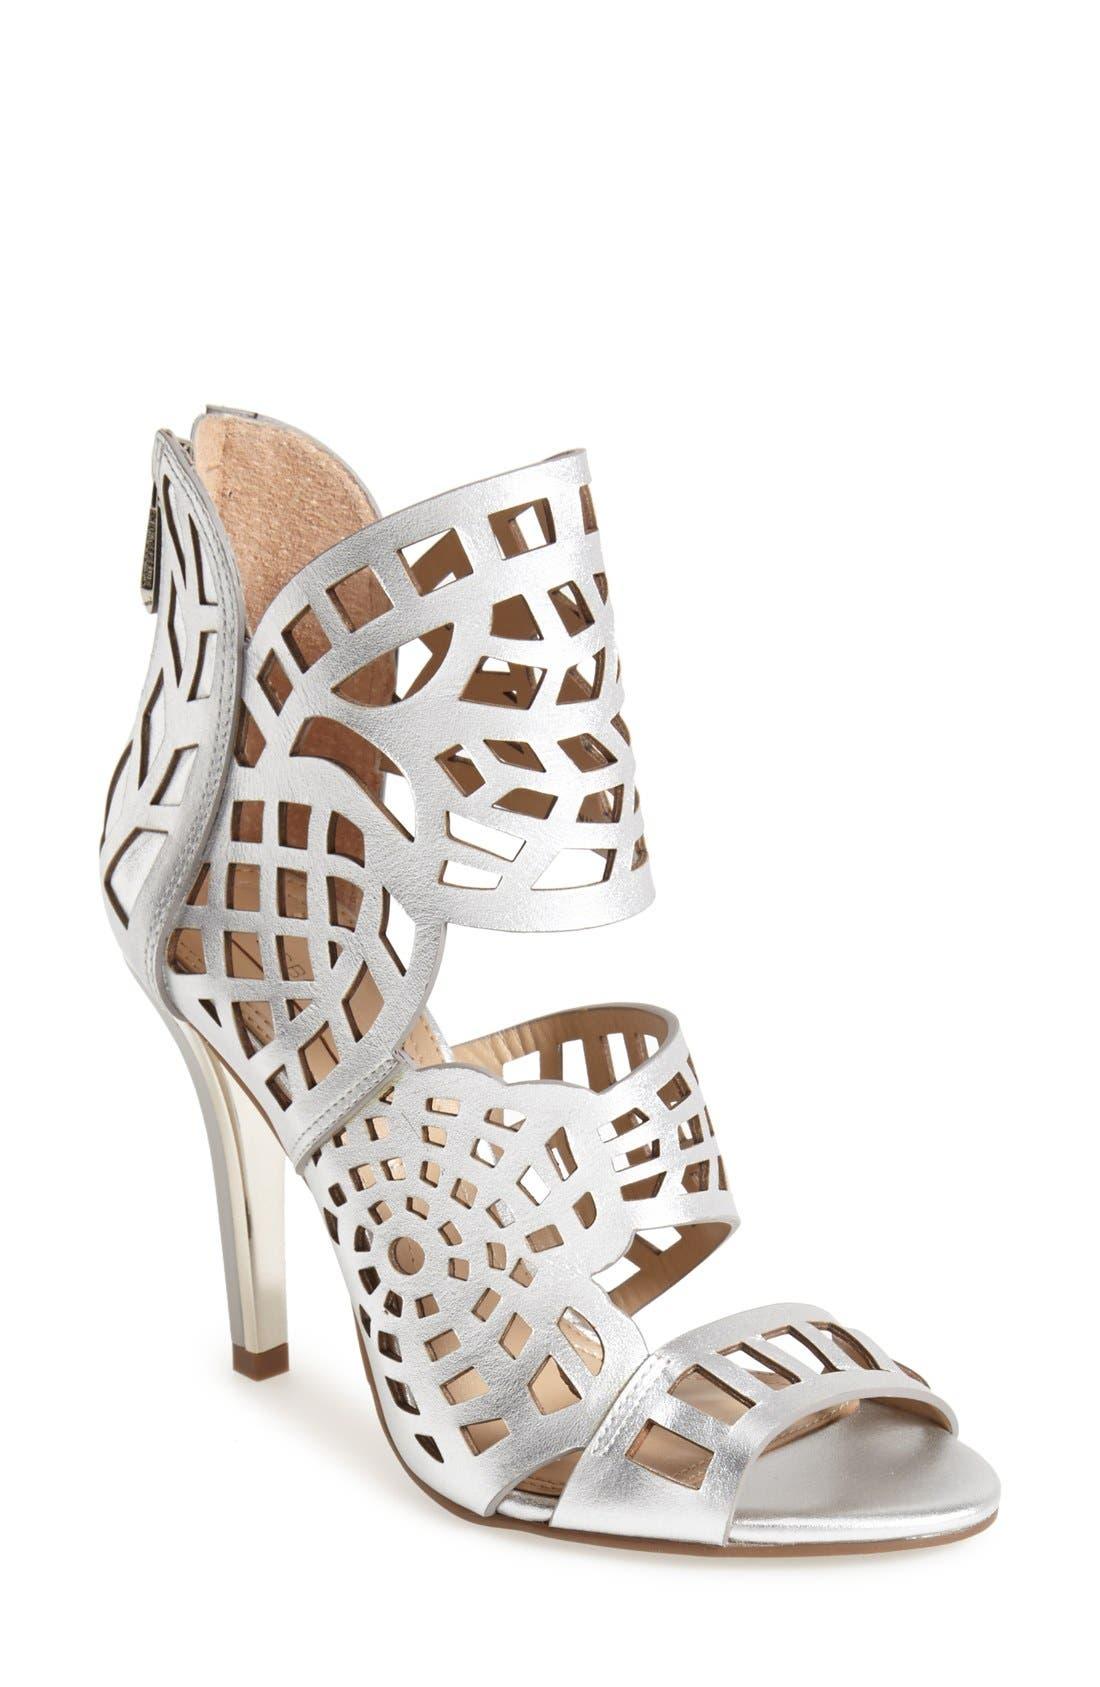 Main Image - BCBGMAXAZRIA 'Maven' Sandal (Women)